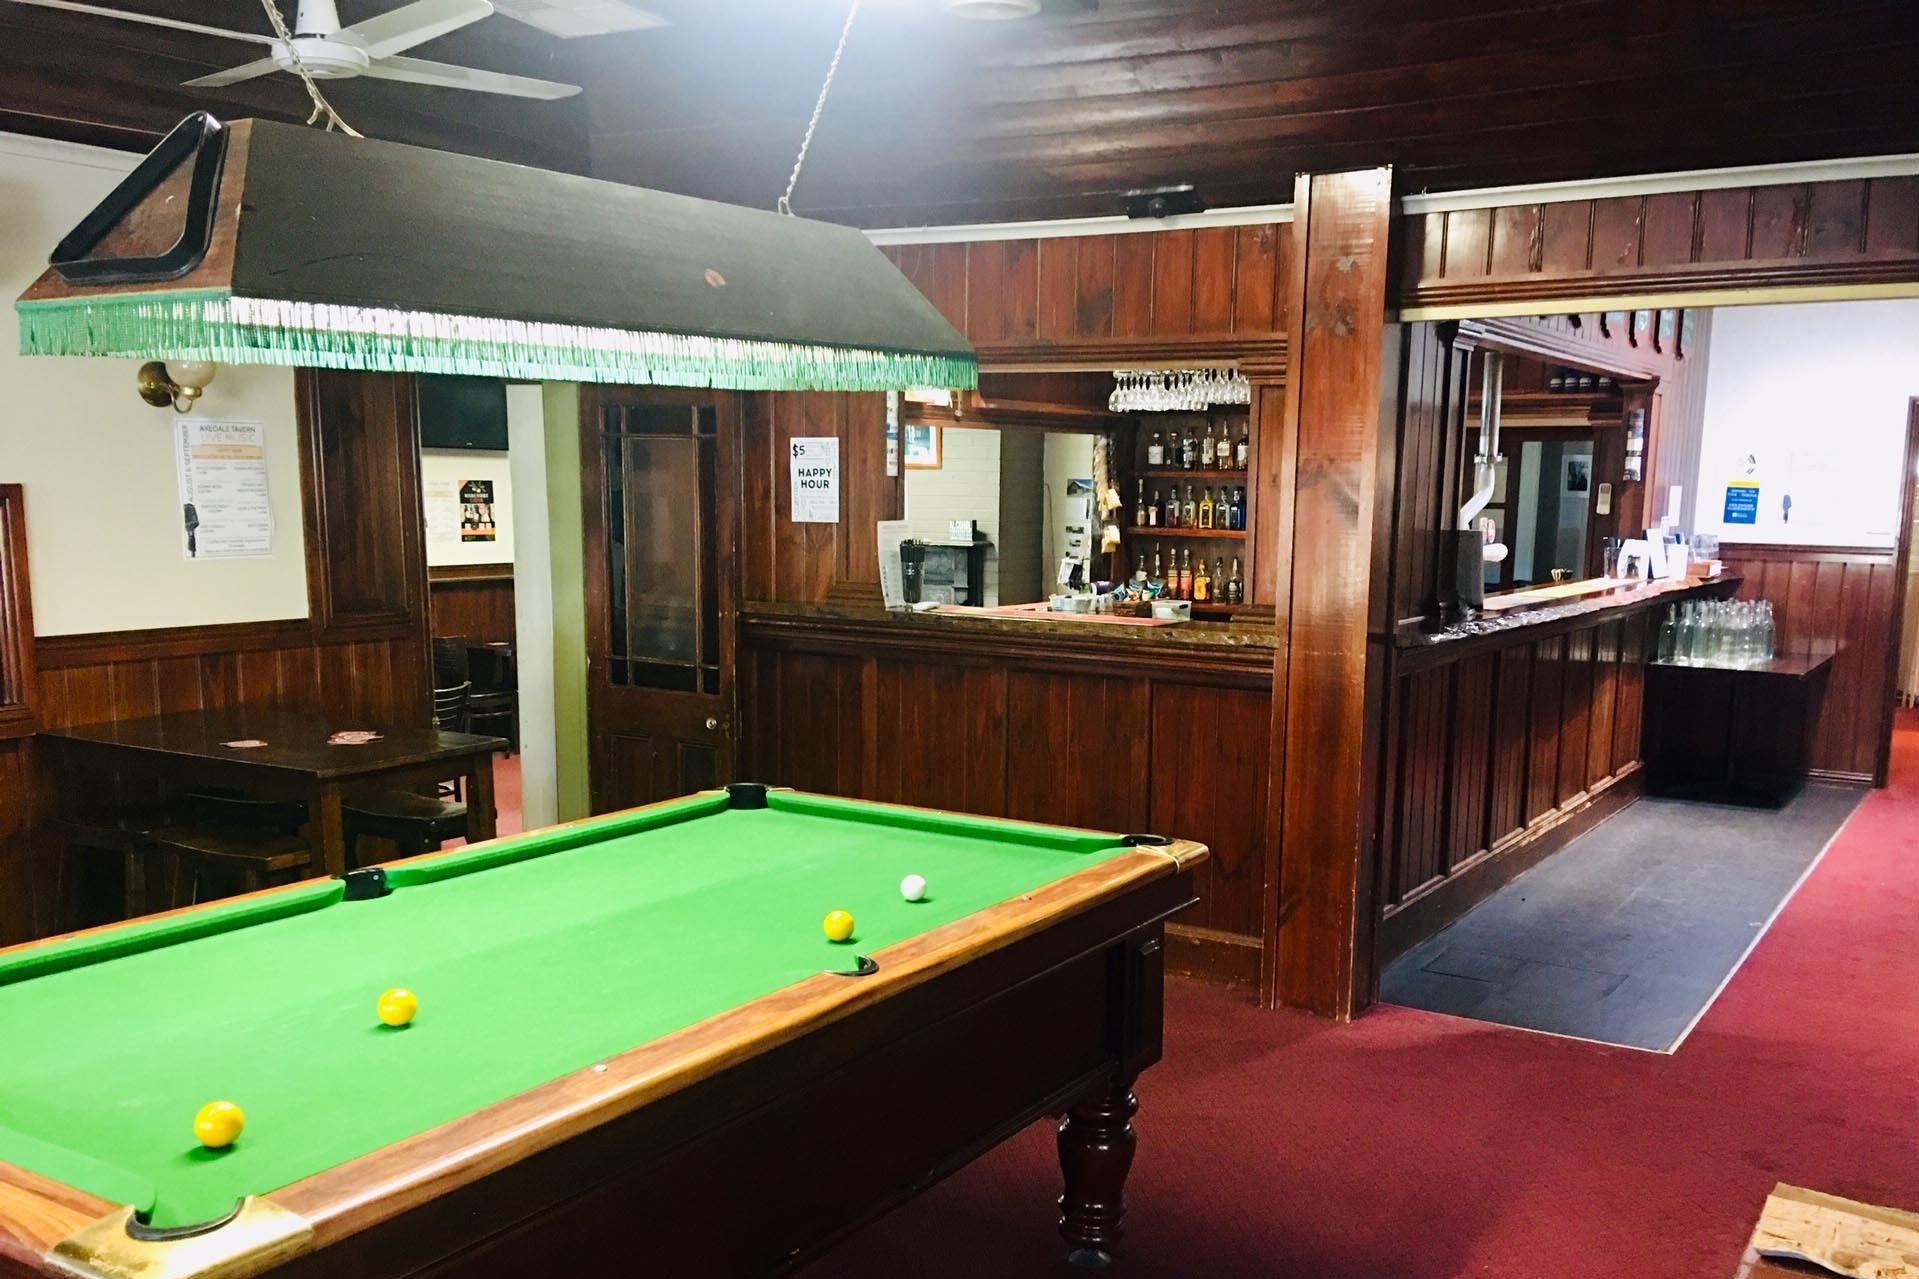 f - Axedale Tavern